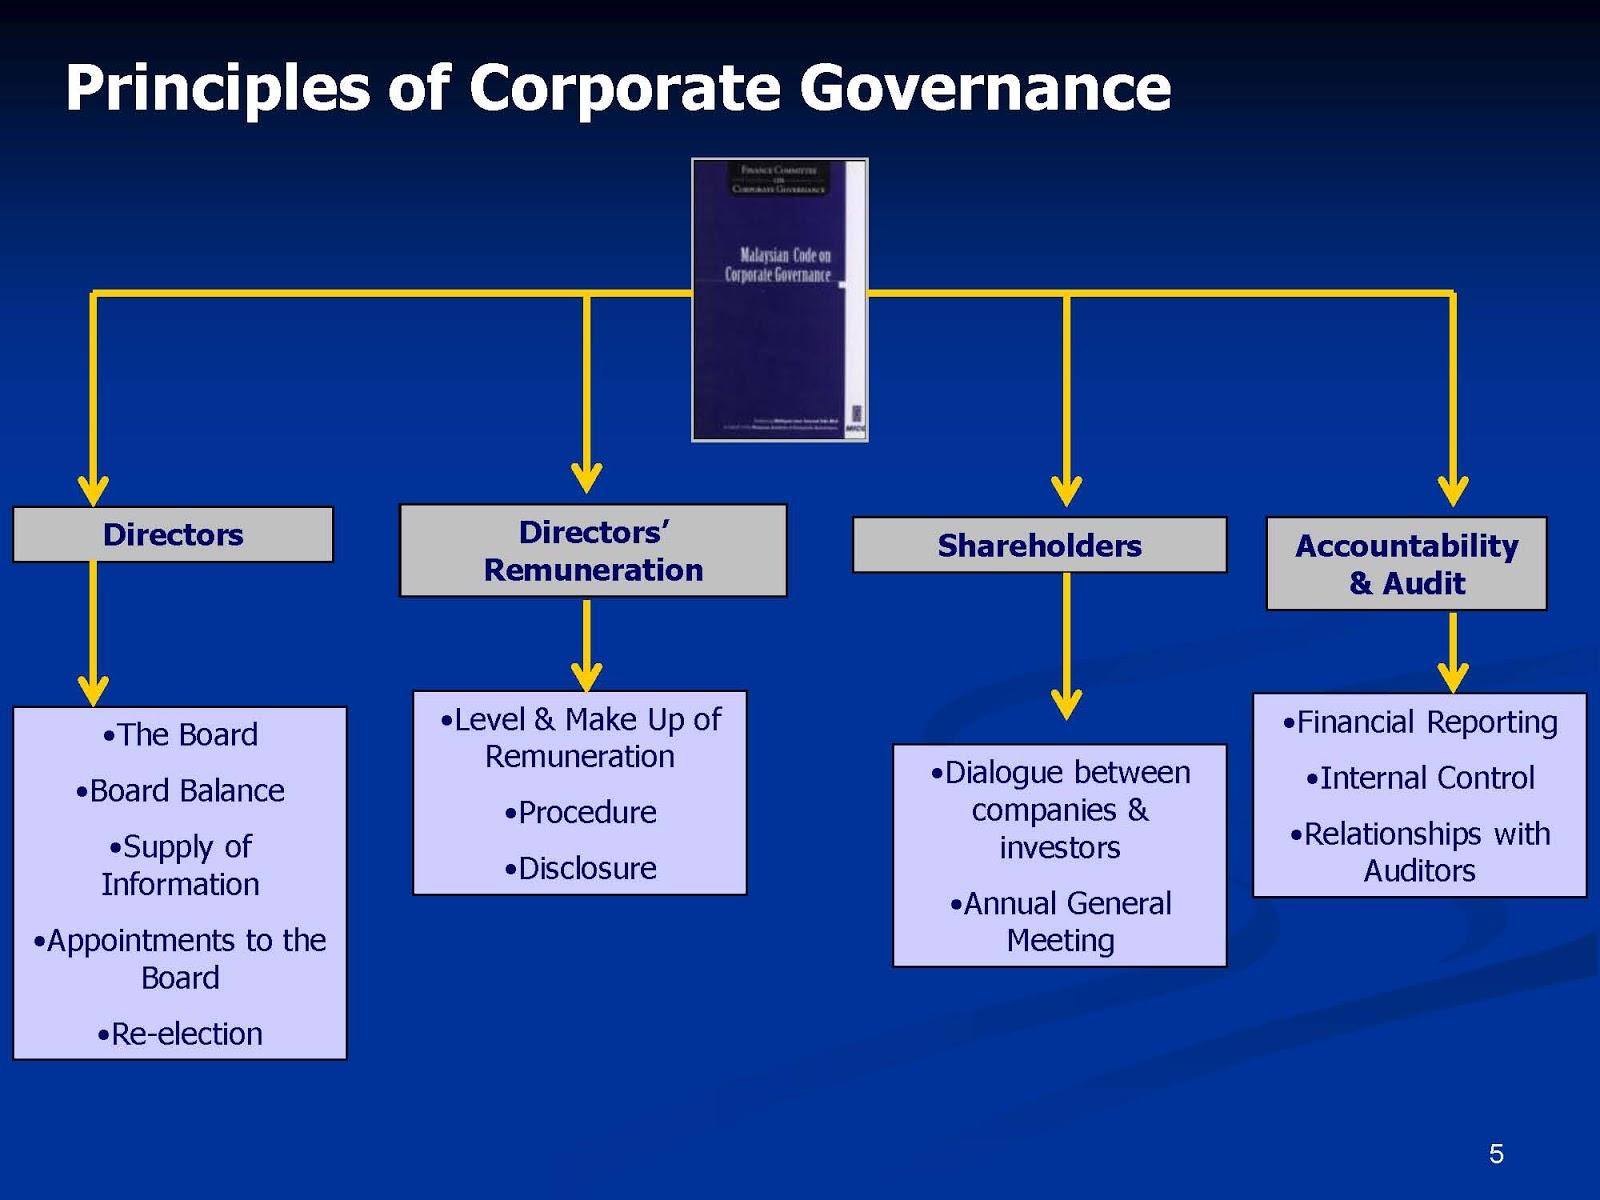 gcg in indonesia Latar belakang dan tujuan good corporate governance (gcg) a)  gcg dan pengawasan pasar modal di indonesia secara formal,.